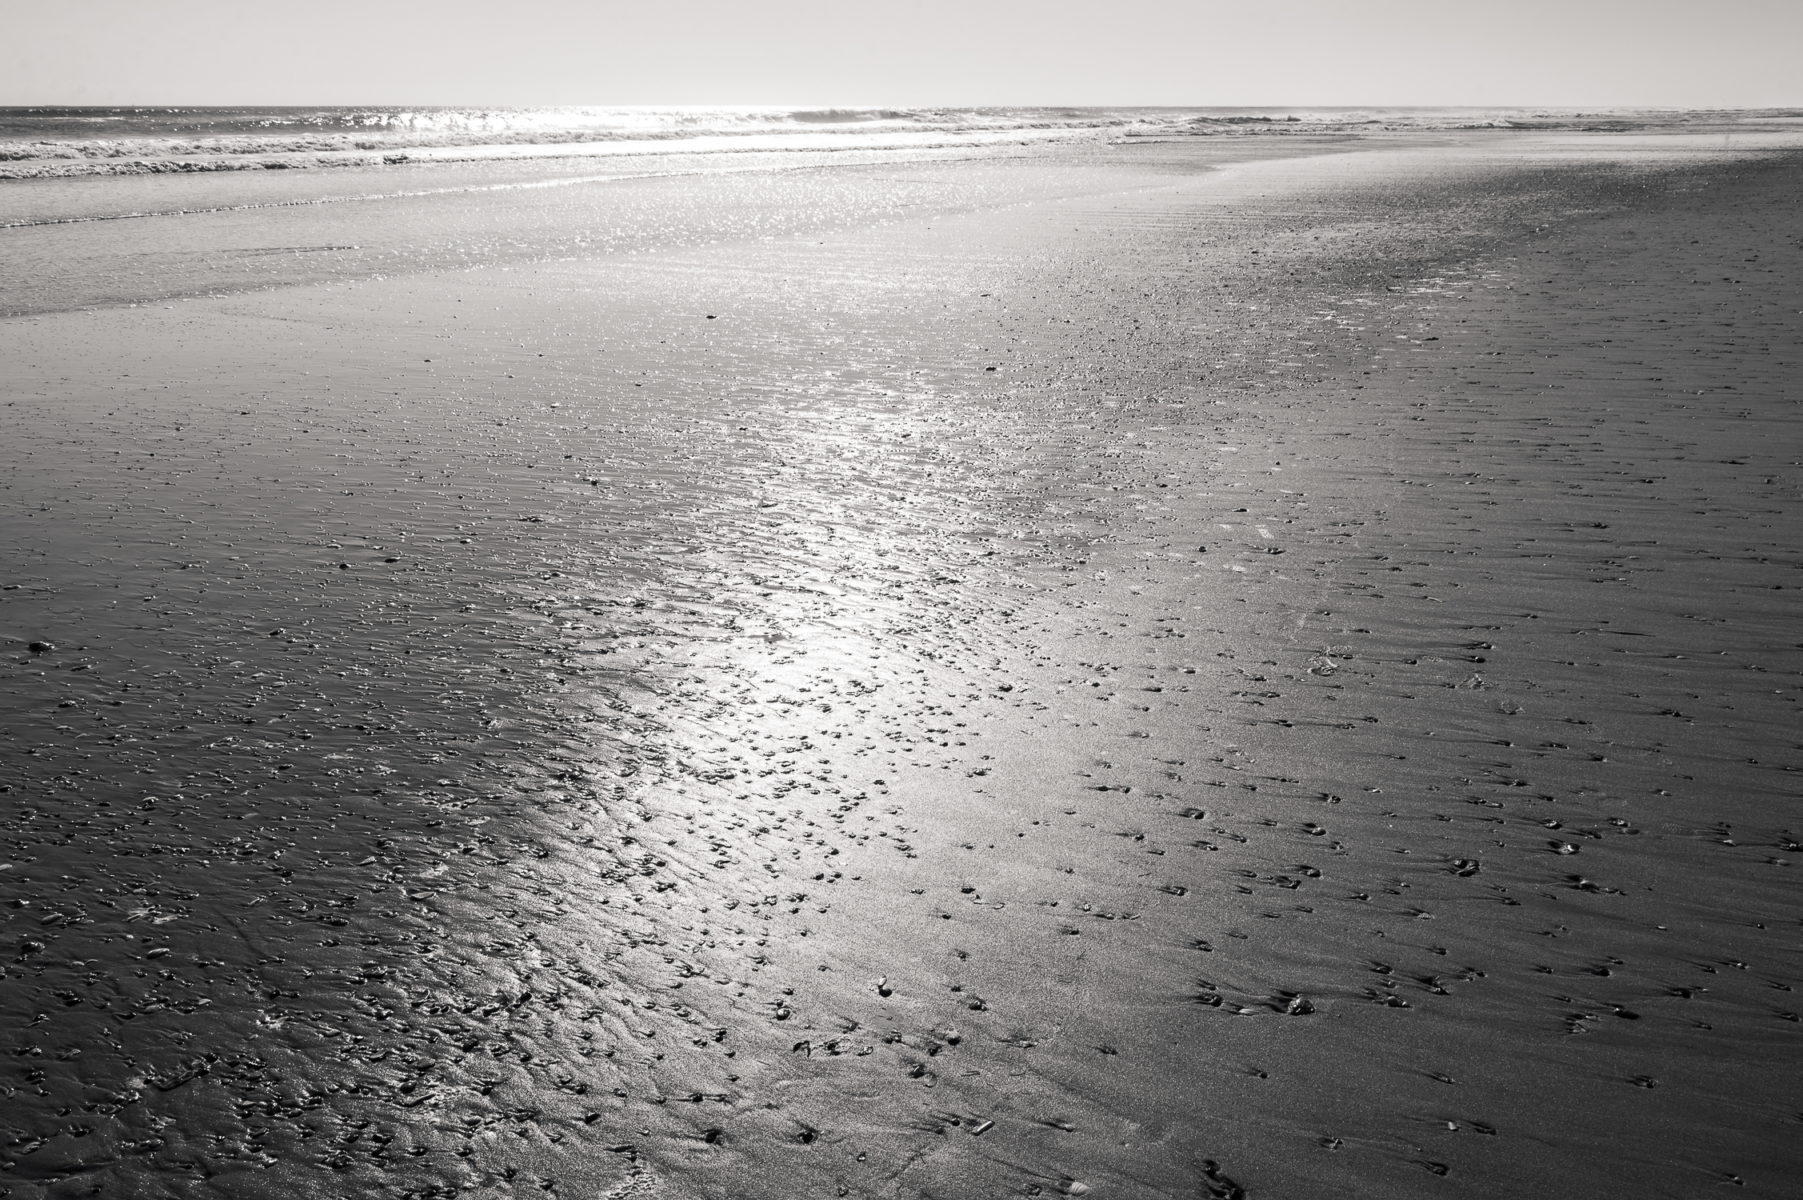 beach at Corolla North Carolina in the offseason